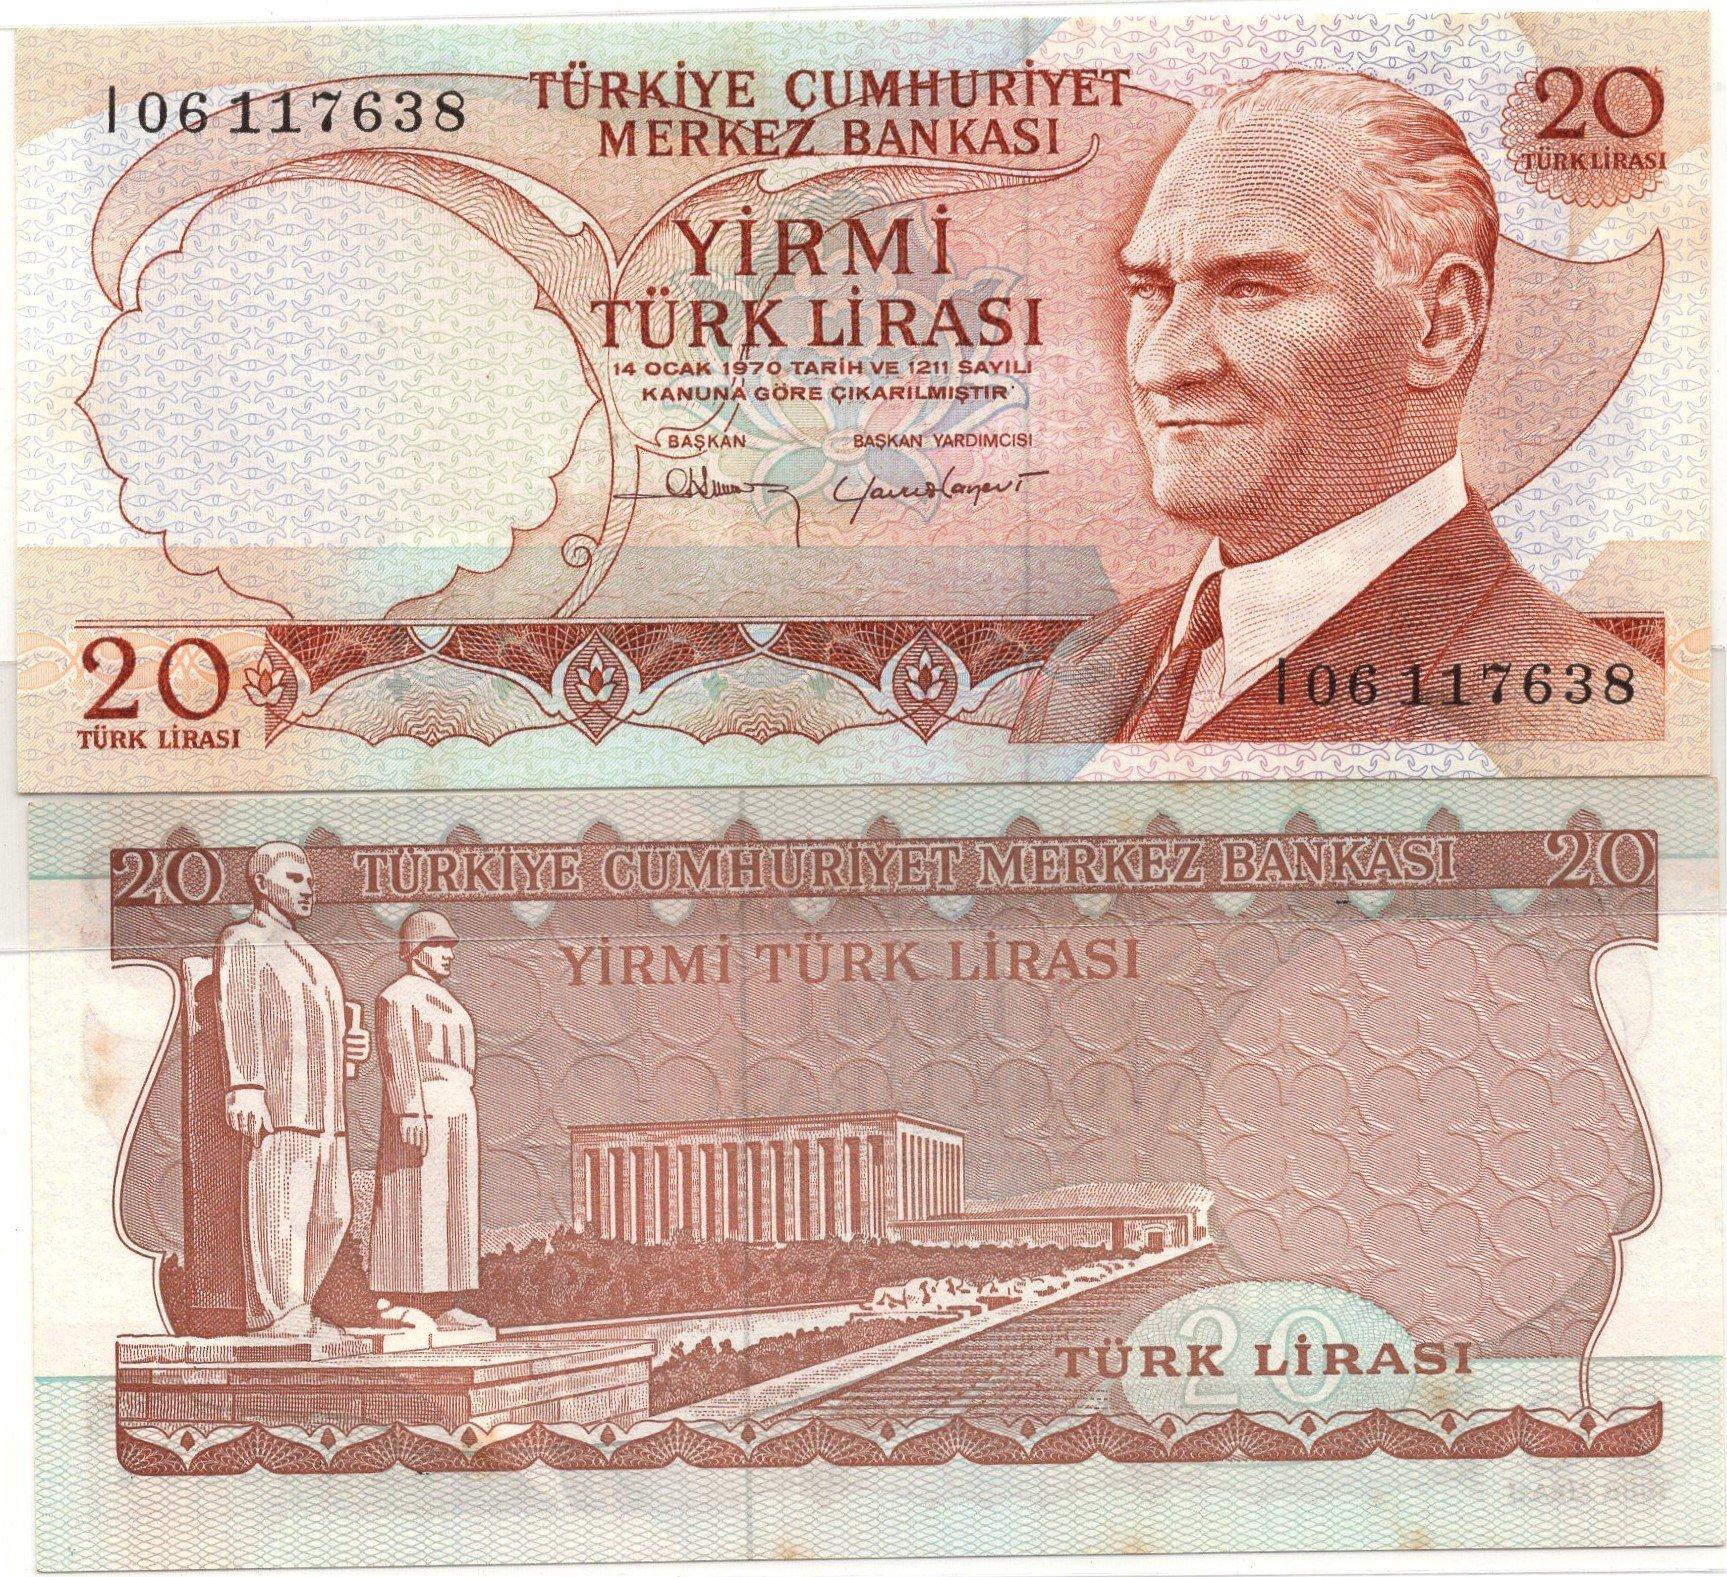 Turkey 20 lirasi 1970 banknote for sale